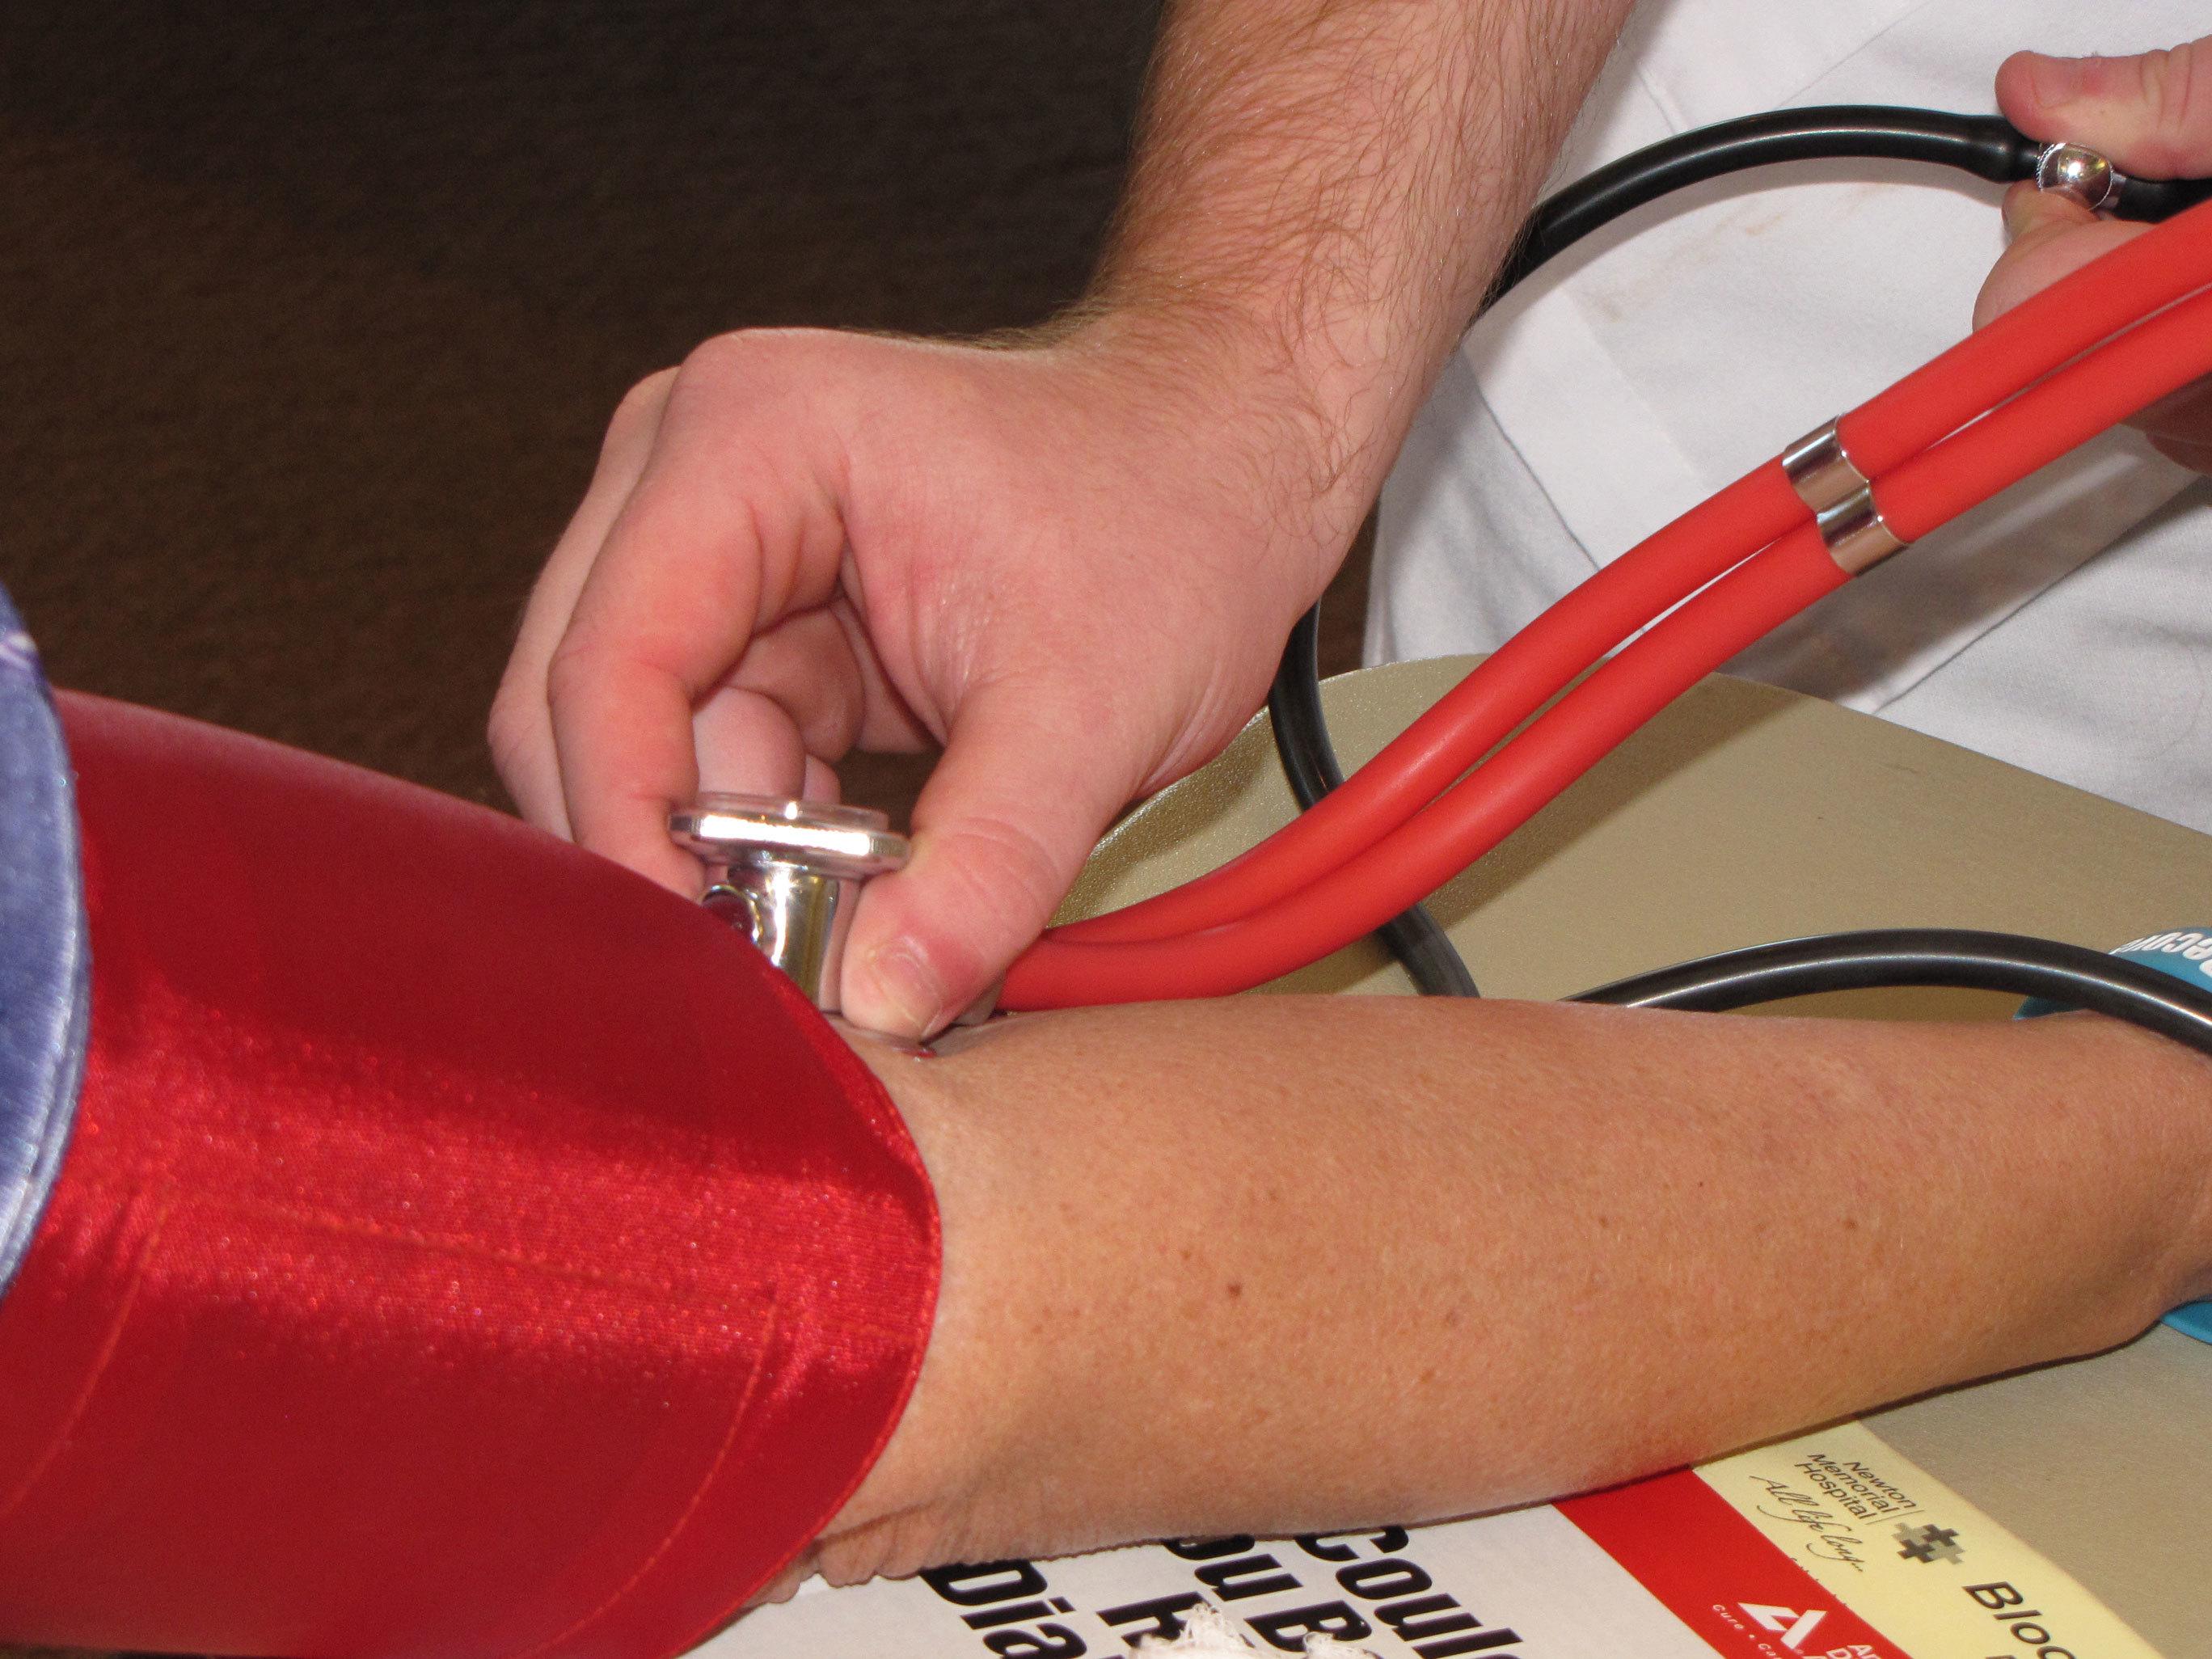 1594410e7e8e826cc3b7_blood-pressure-close-up.jpg